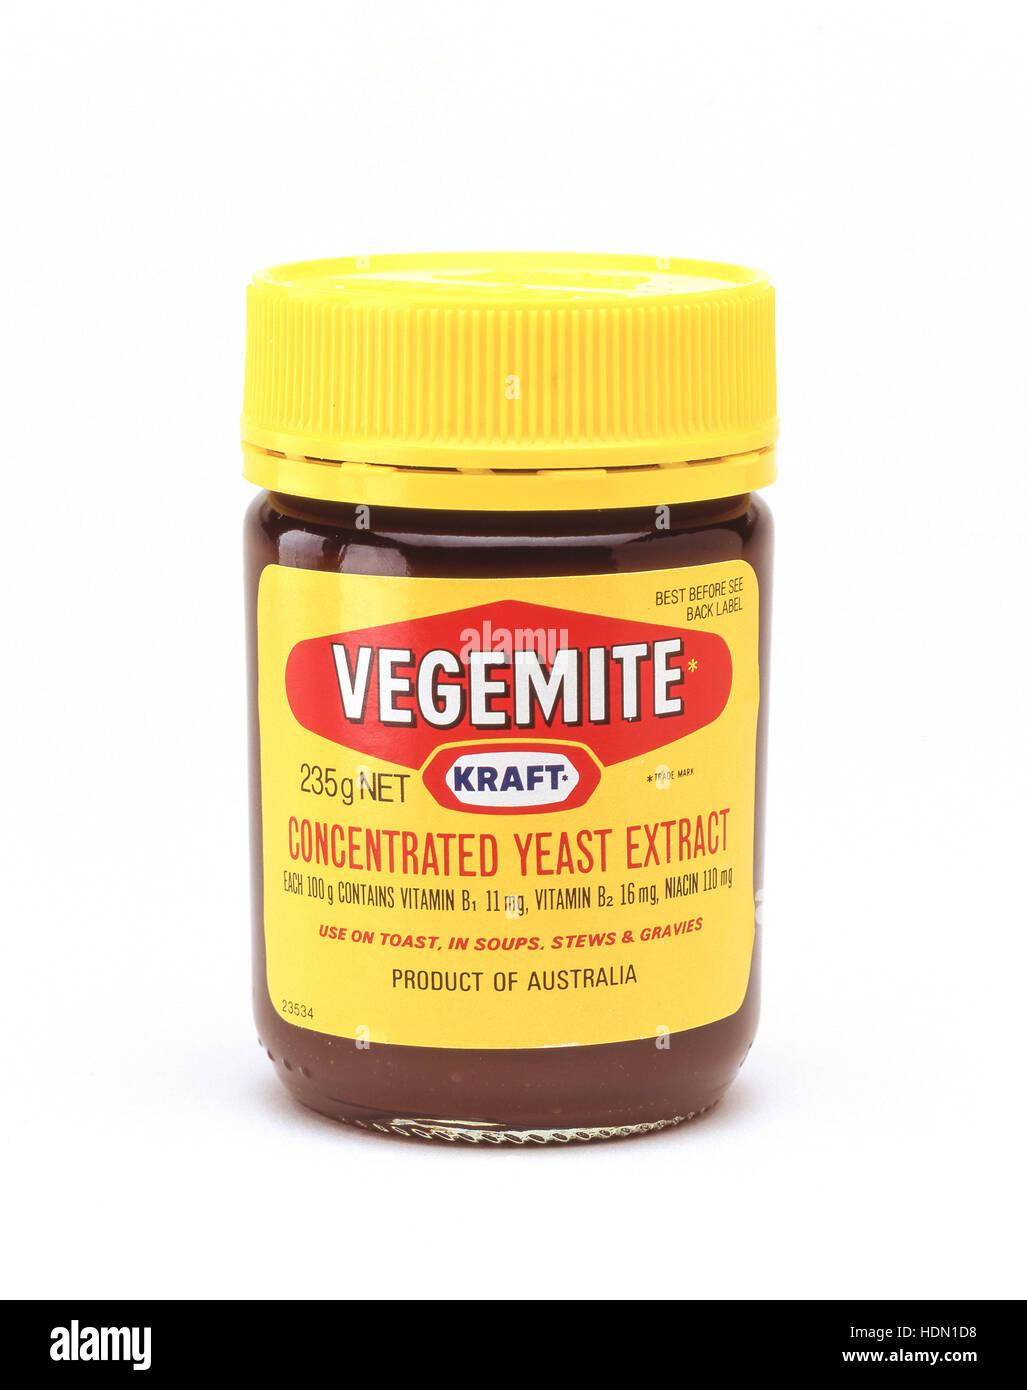 Jar of Australian Vegemite spread, Sydney, New South Wales, Australia - Stock Image